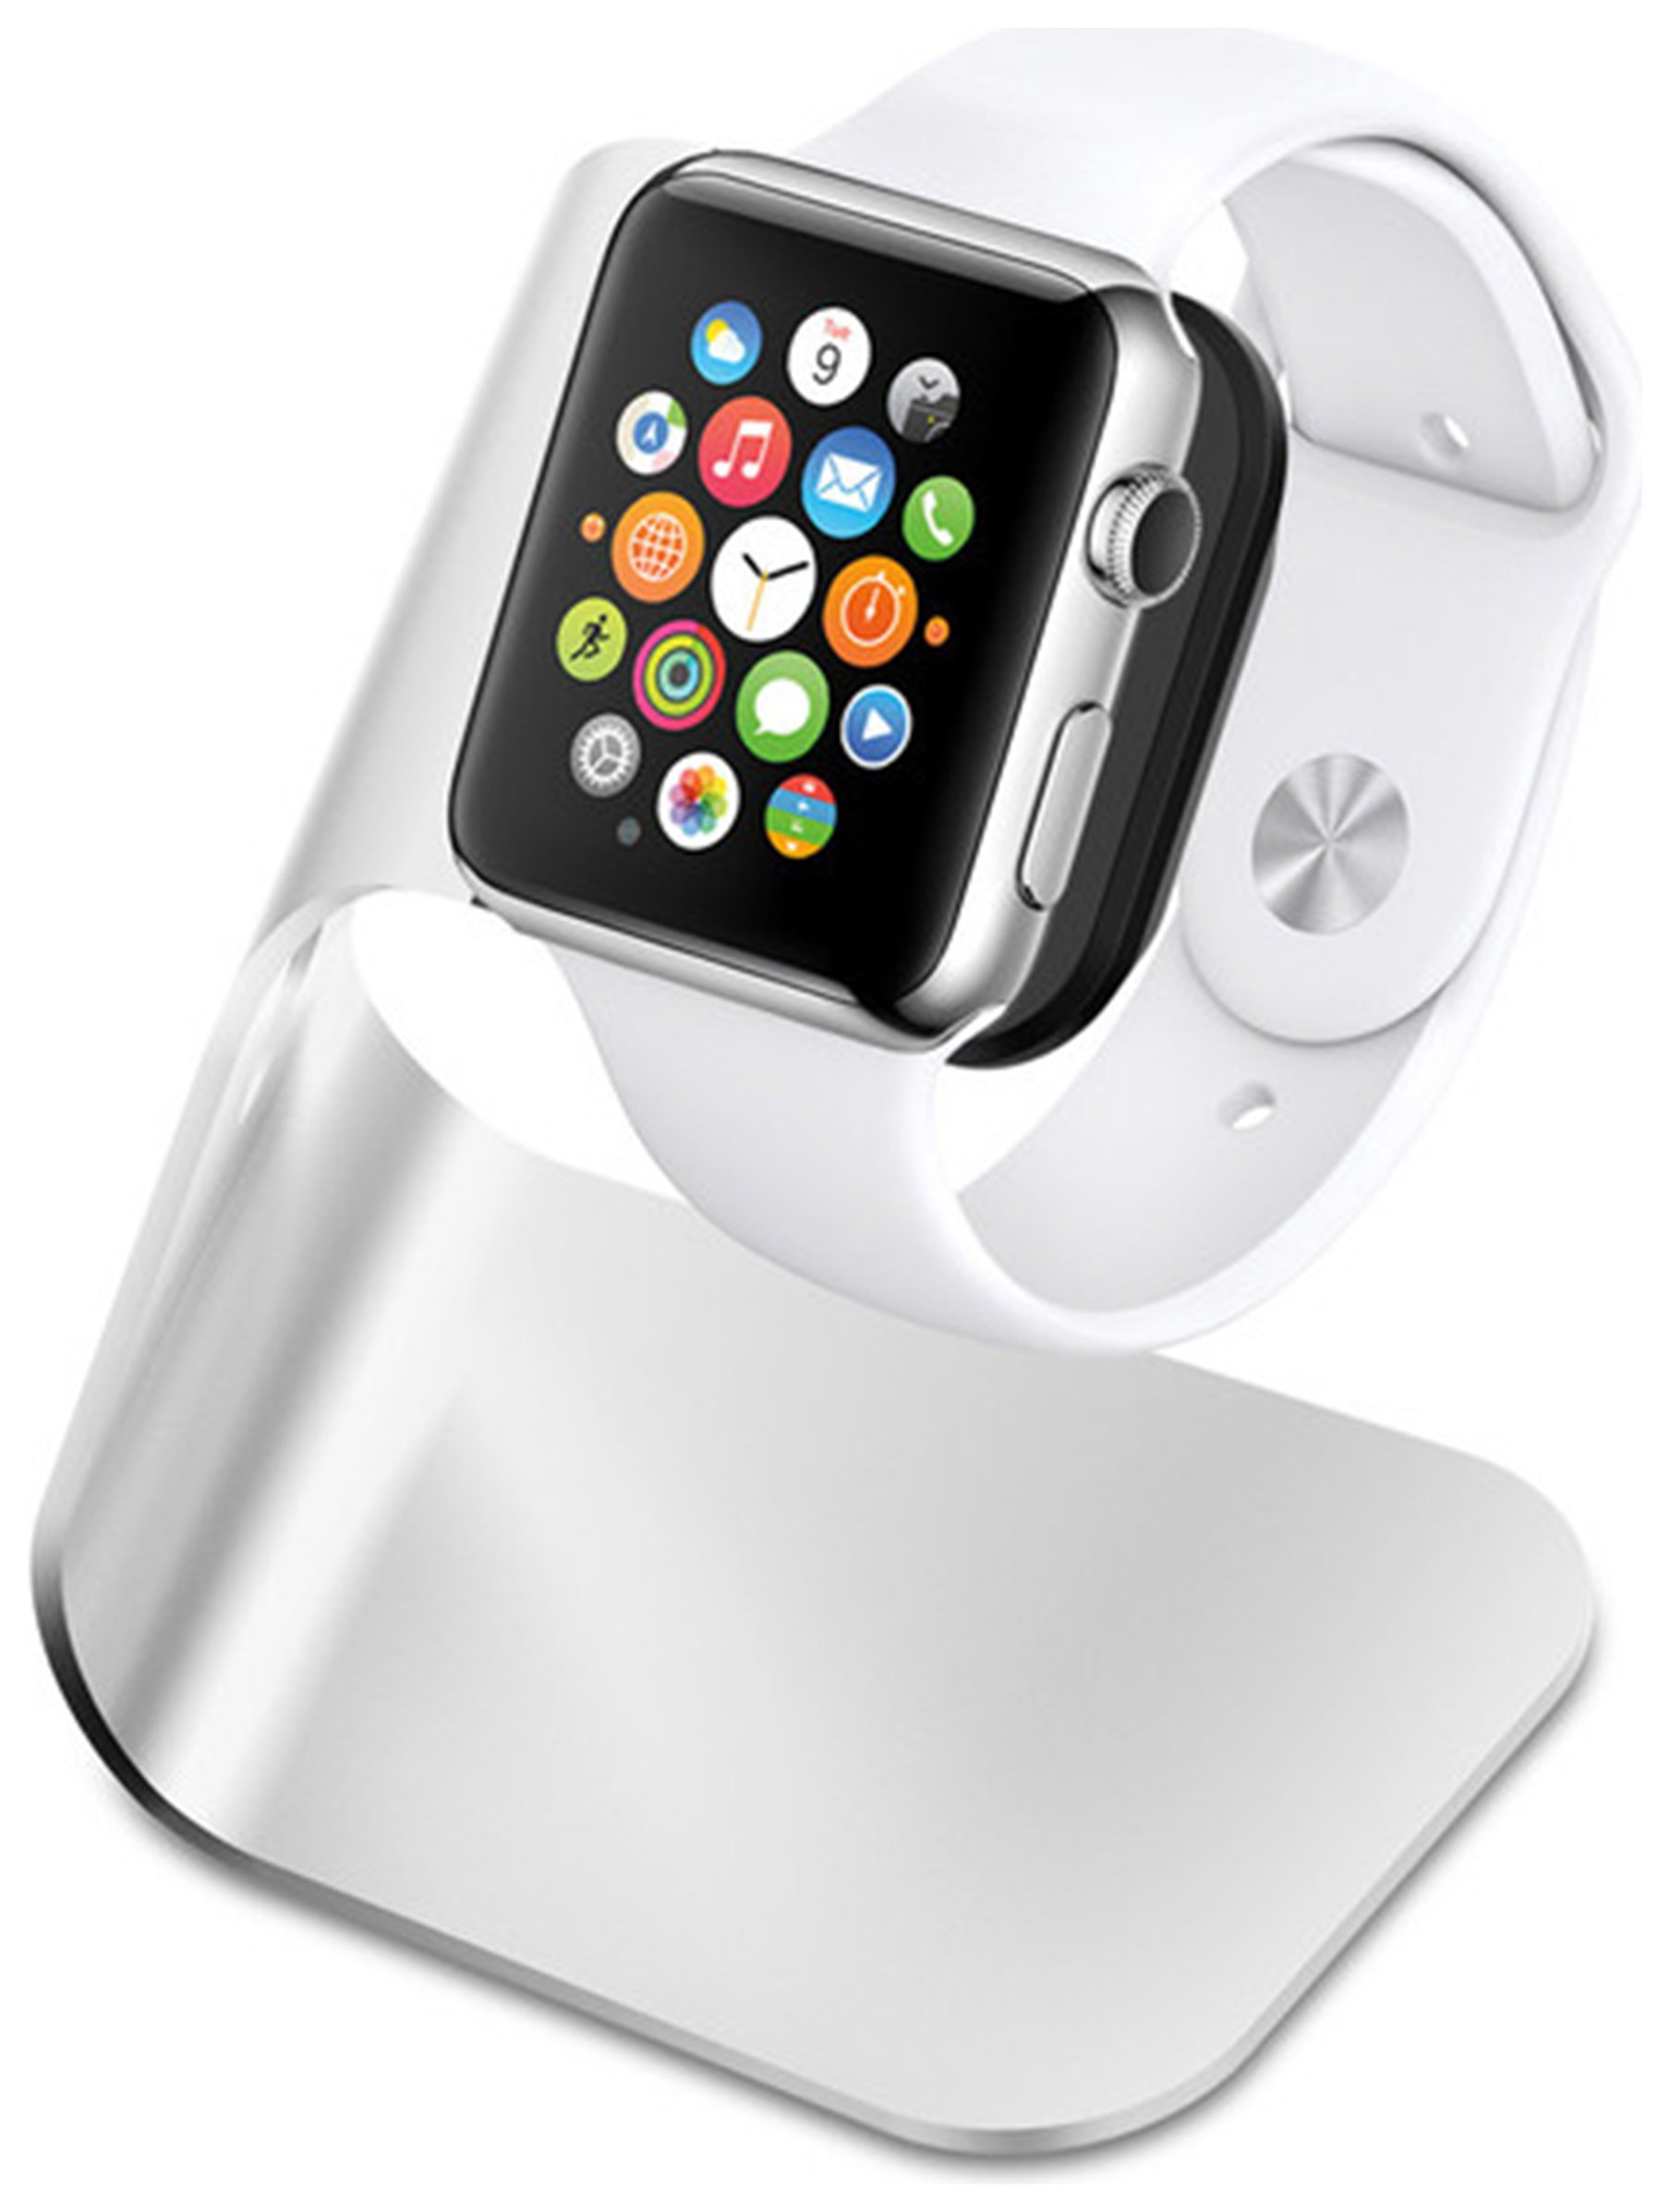 Argos Wall Murals Sale On Apple Spigen Watch Stand S330 Silver Apple